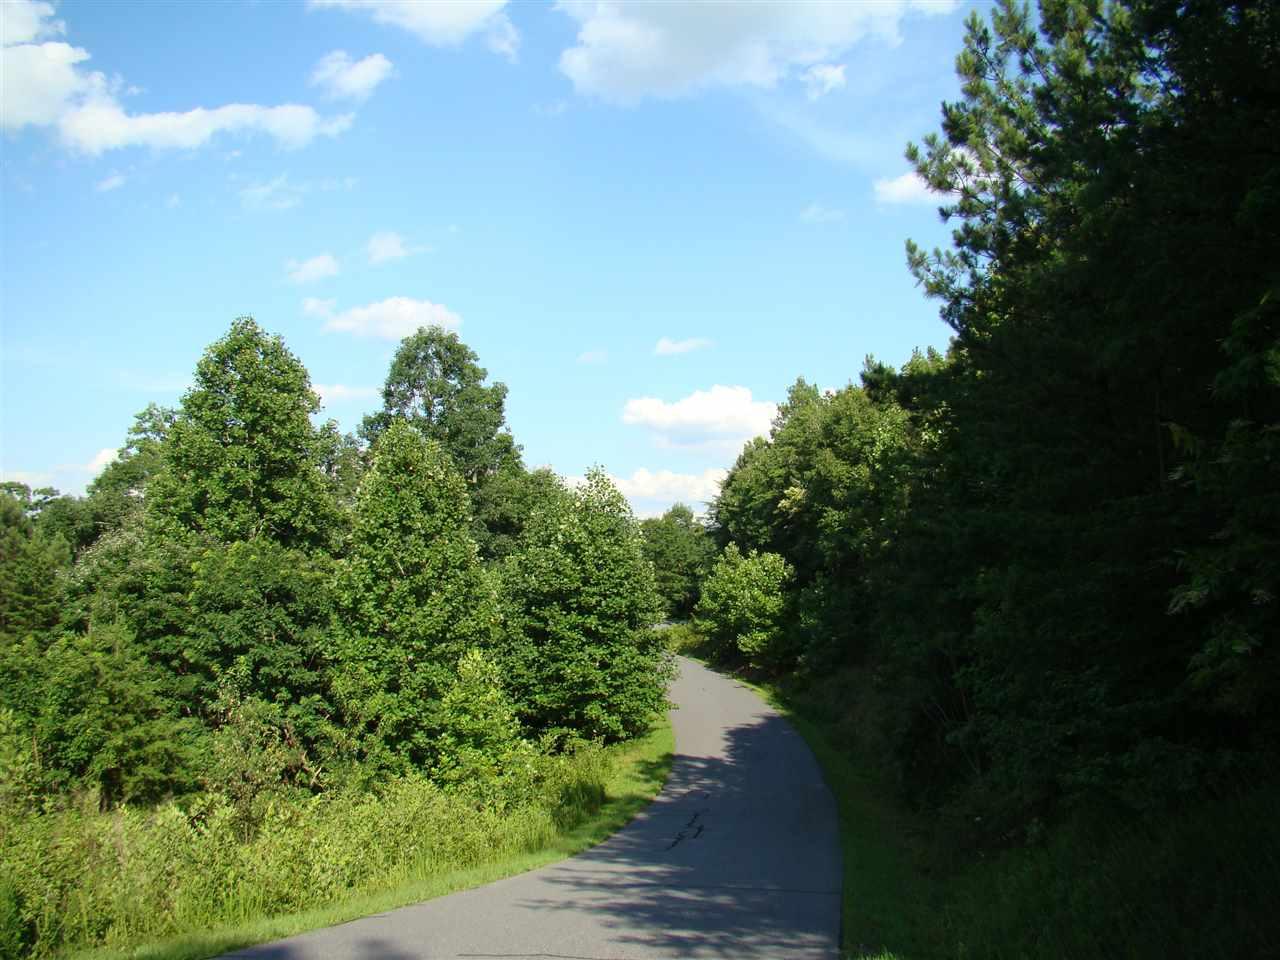 268 Autumn Lane, Bostic, NC 28018